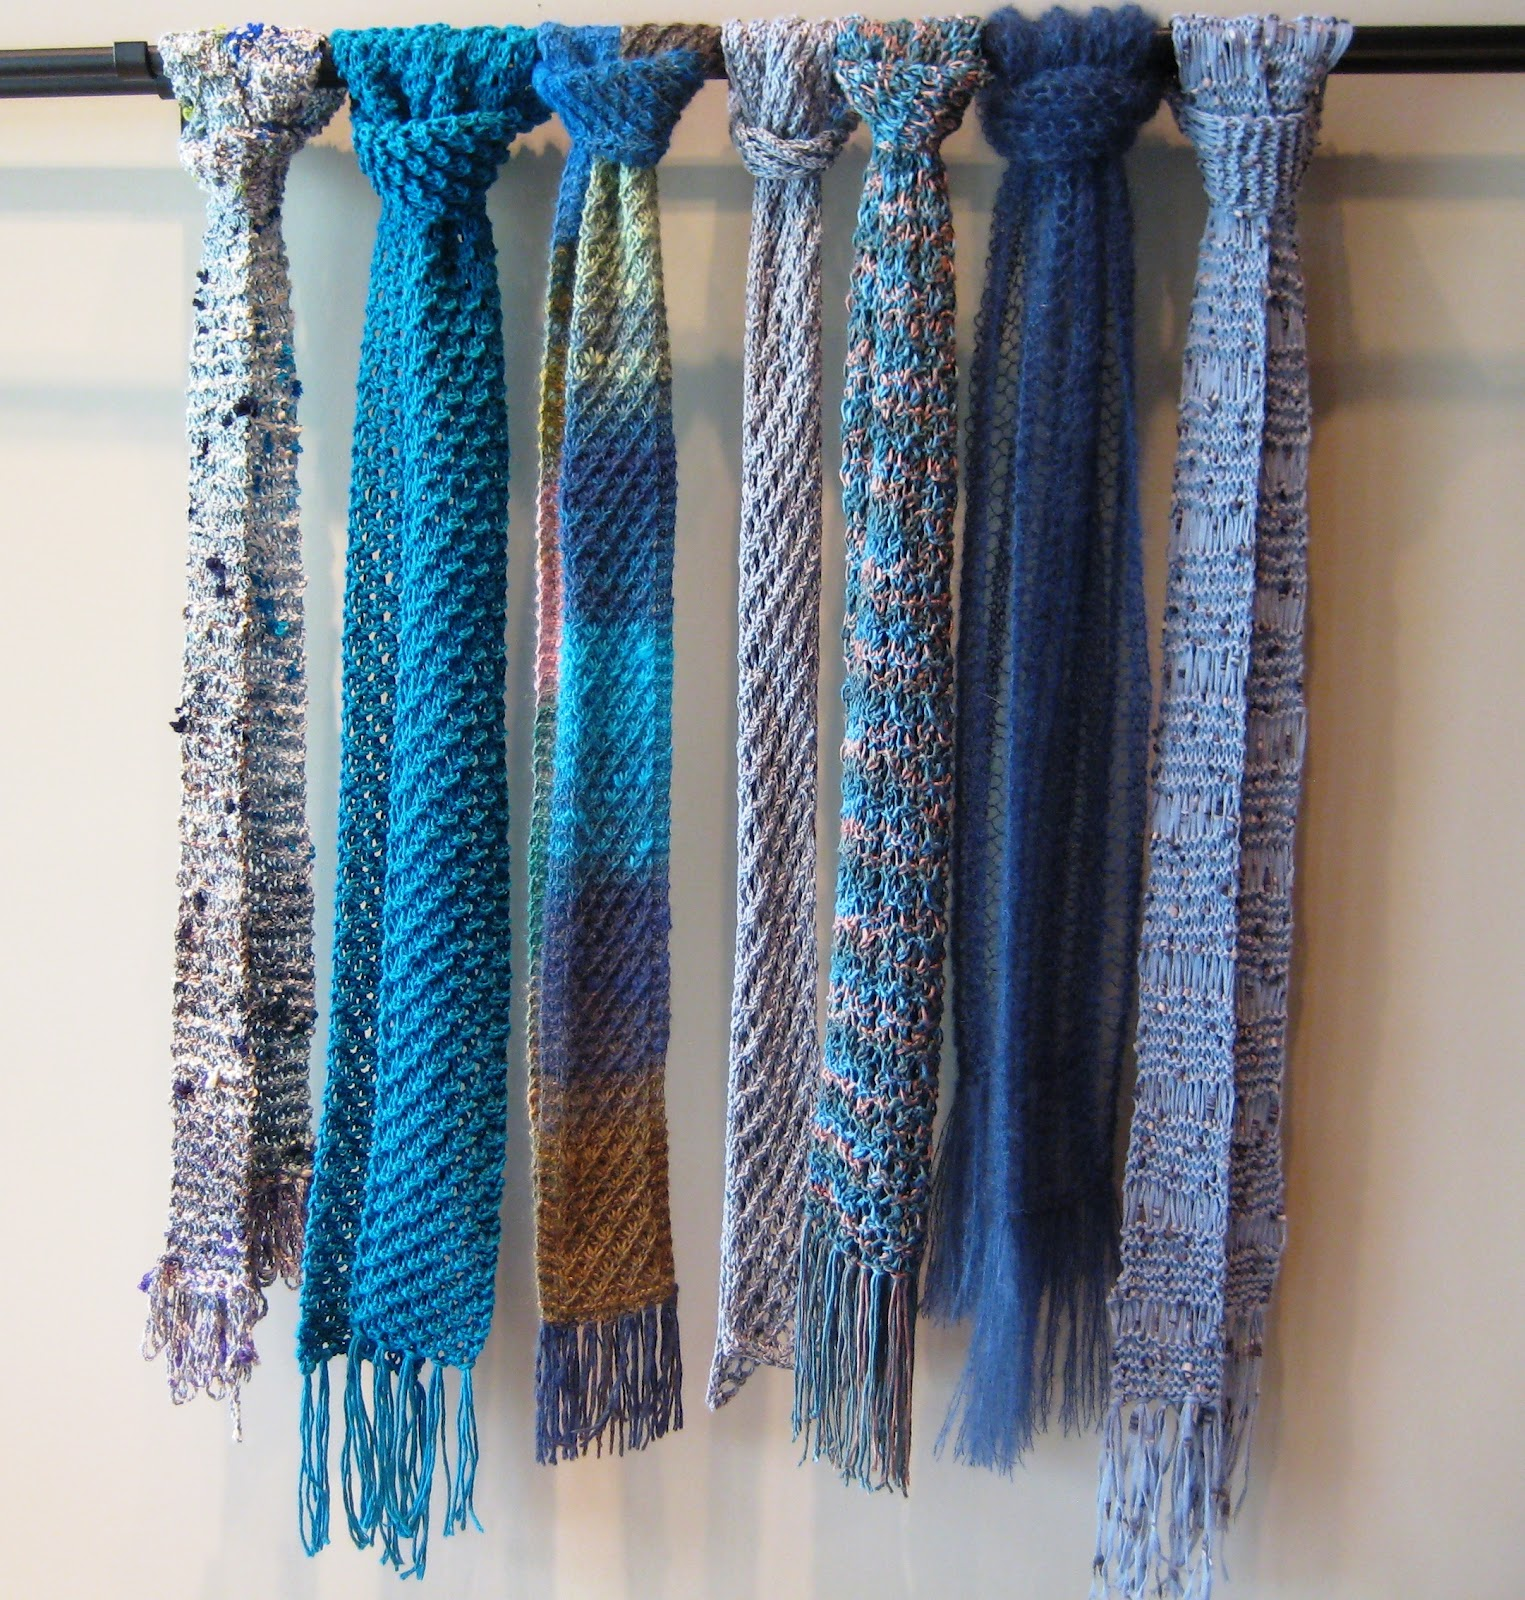 k2tog with nancy wyatt shades of blue summer scarves